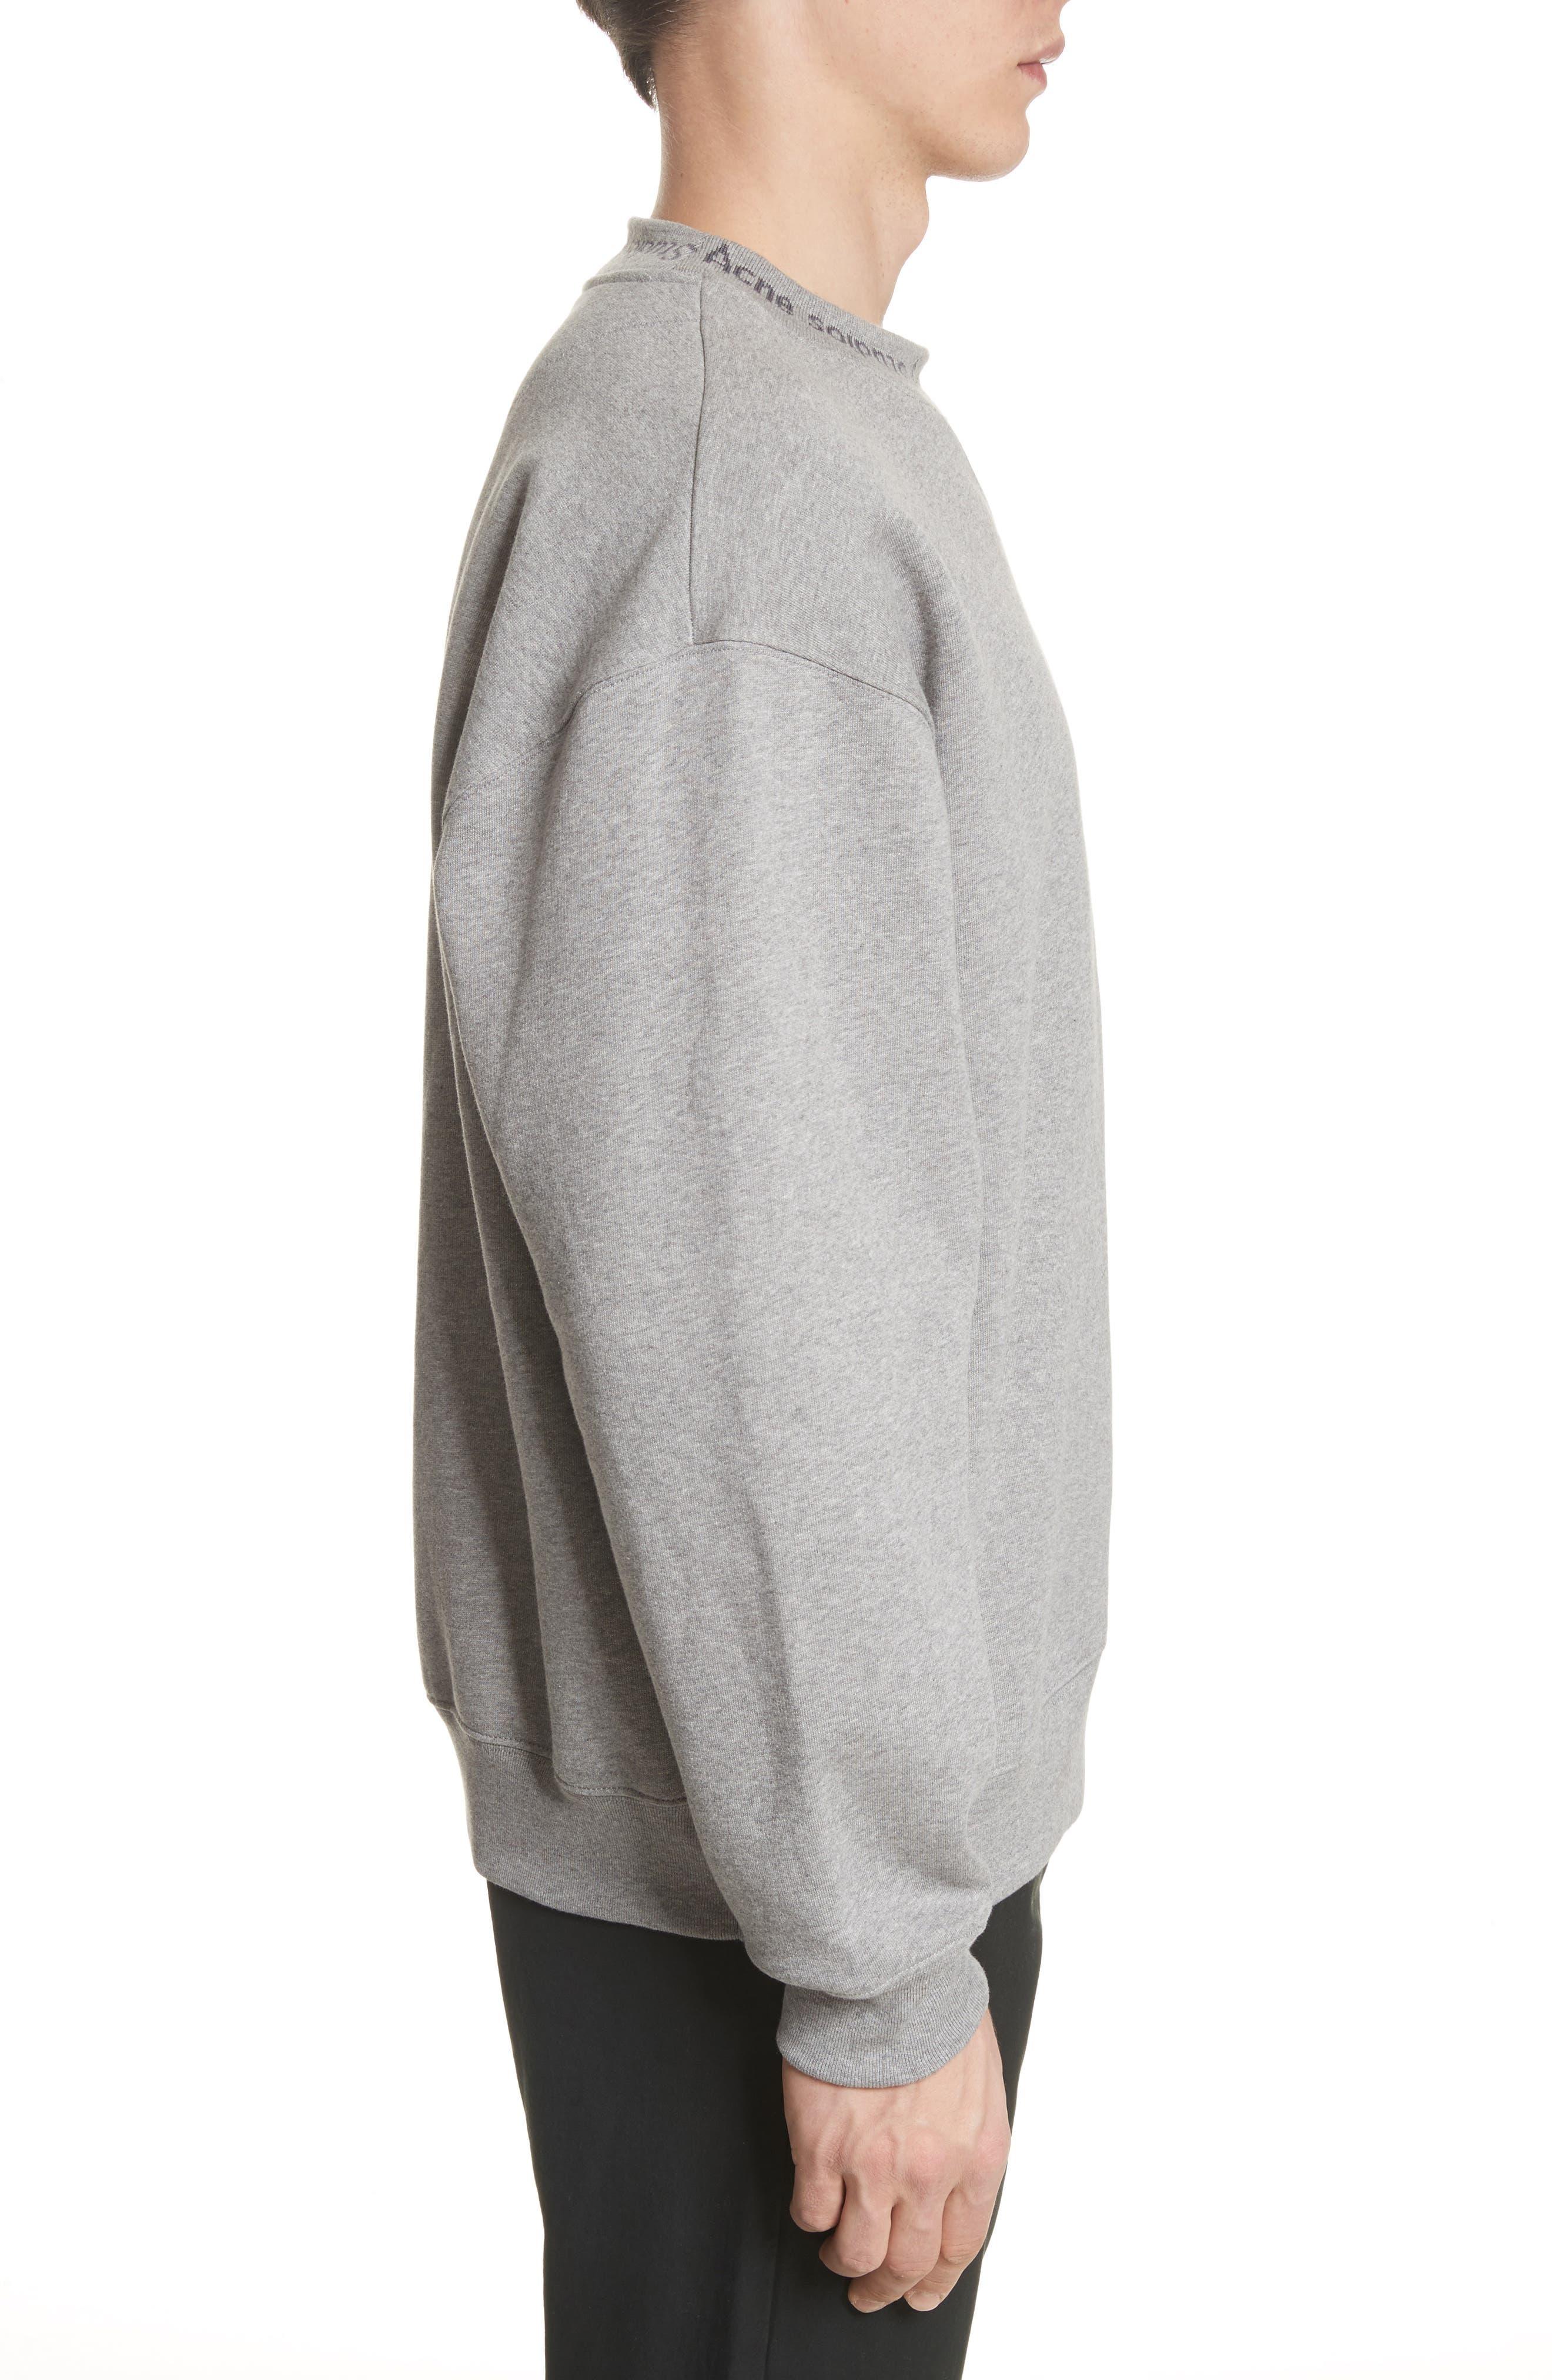 Flogo Oversize Cotton Sweatshirt,                             Alternate thumbnail 3, color,                             LIGHT GREY MELANGE